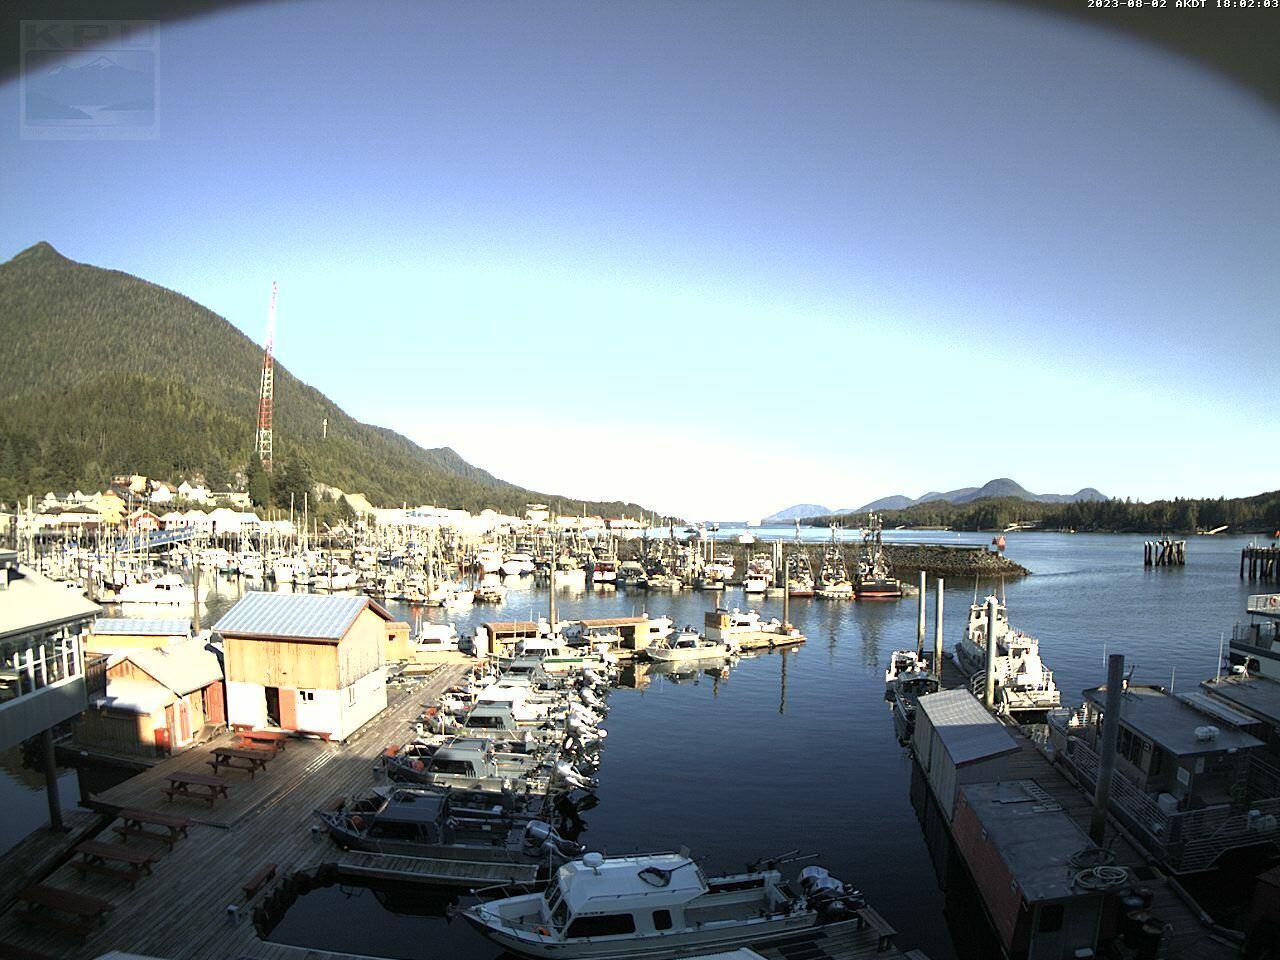 Current Ketchikan Webcam #6 Alaska-sized Image